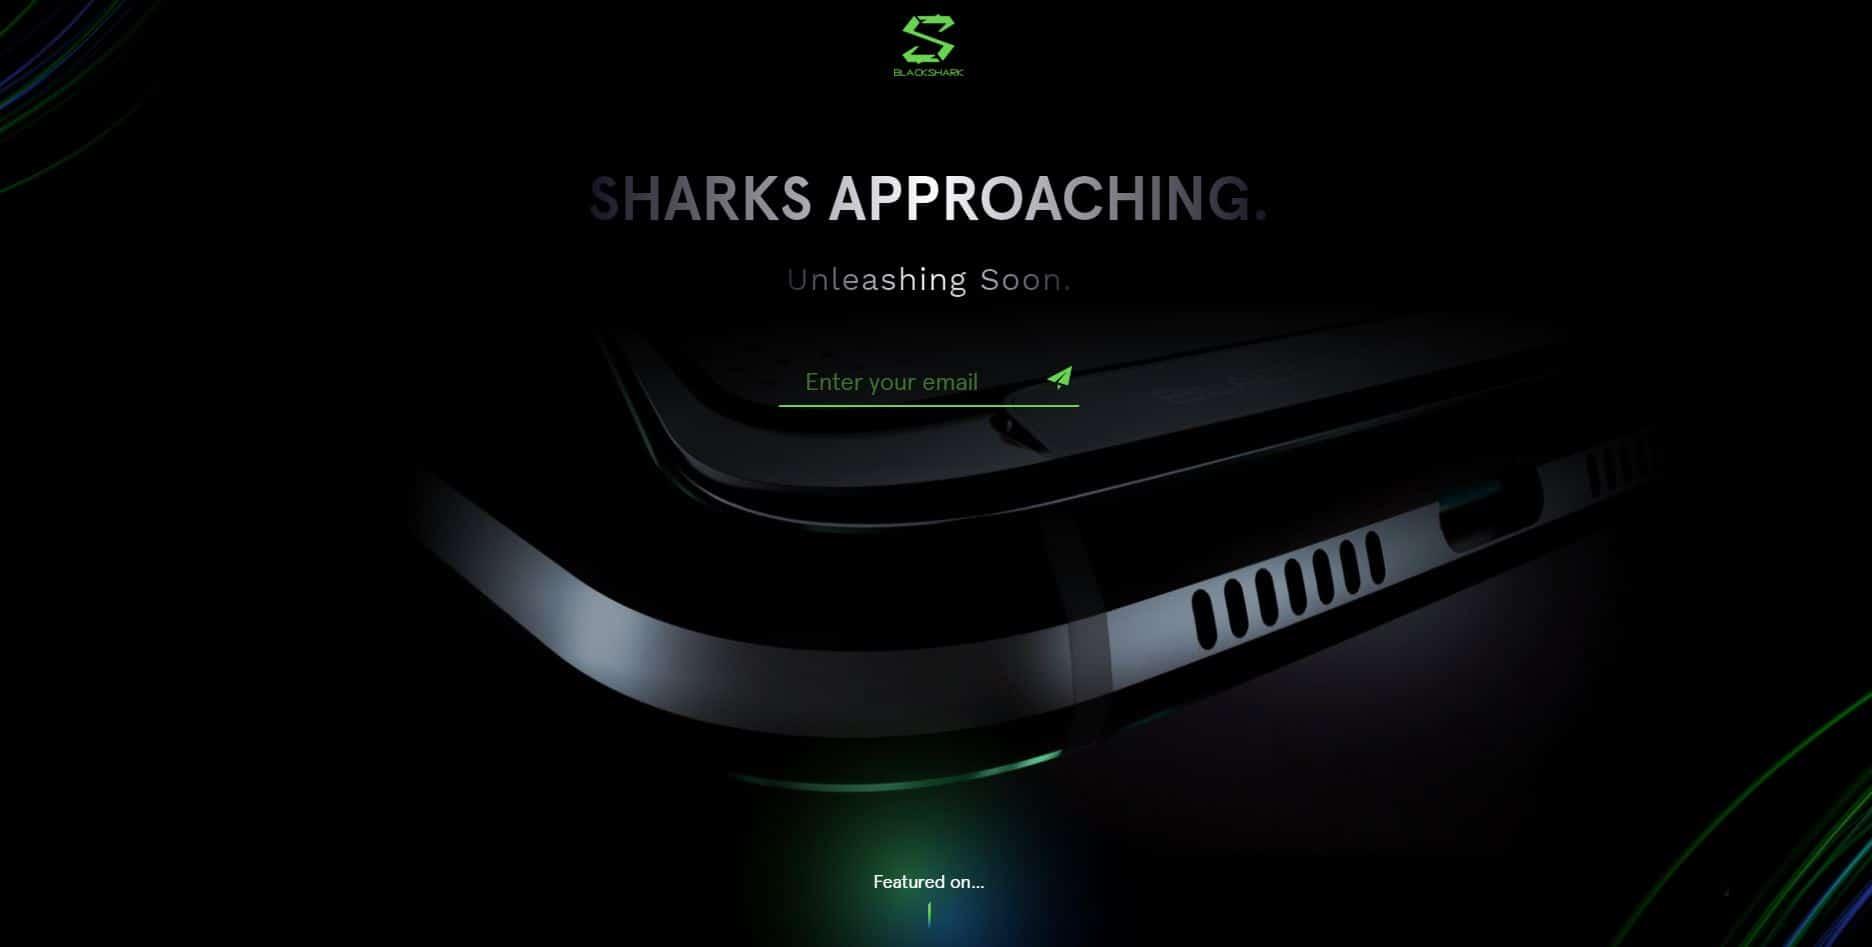 Xiaomi Black Shark 2 Sortie Mondiale Imminente Pour